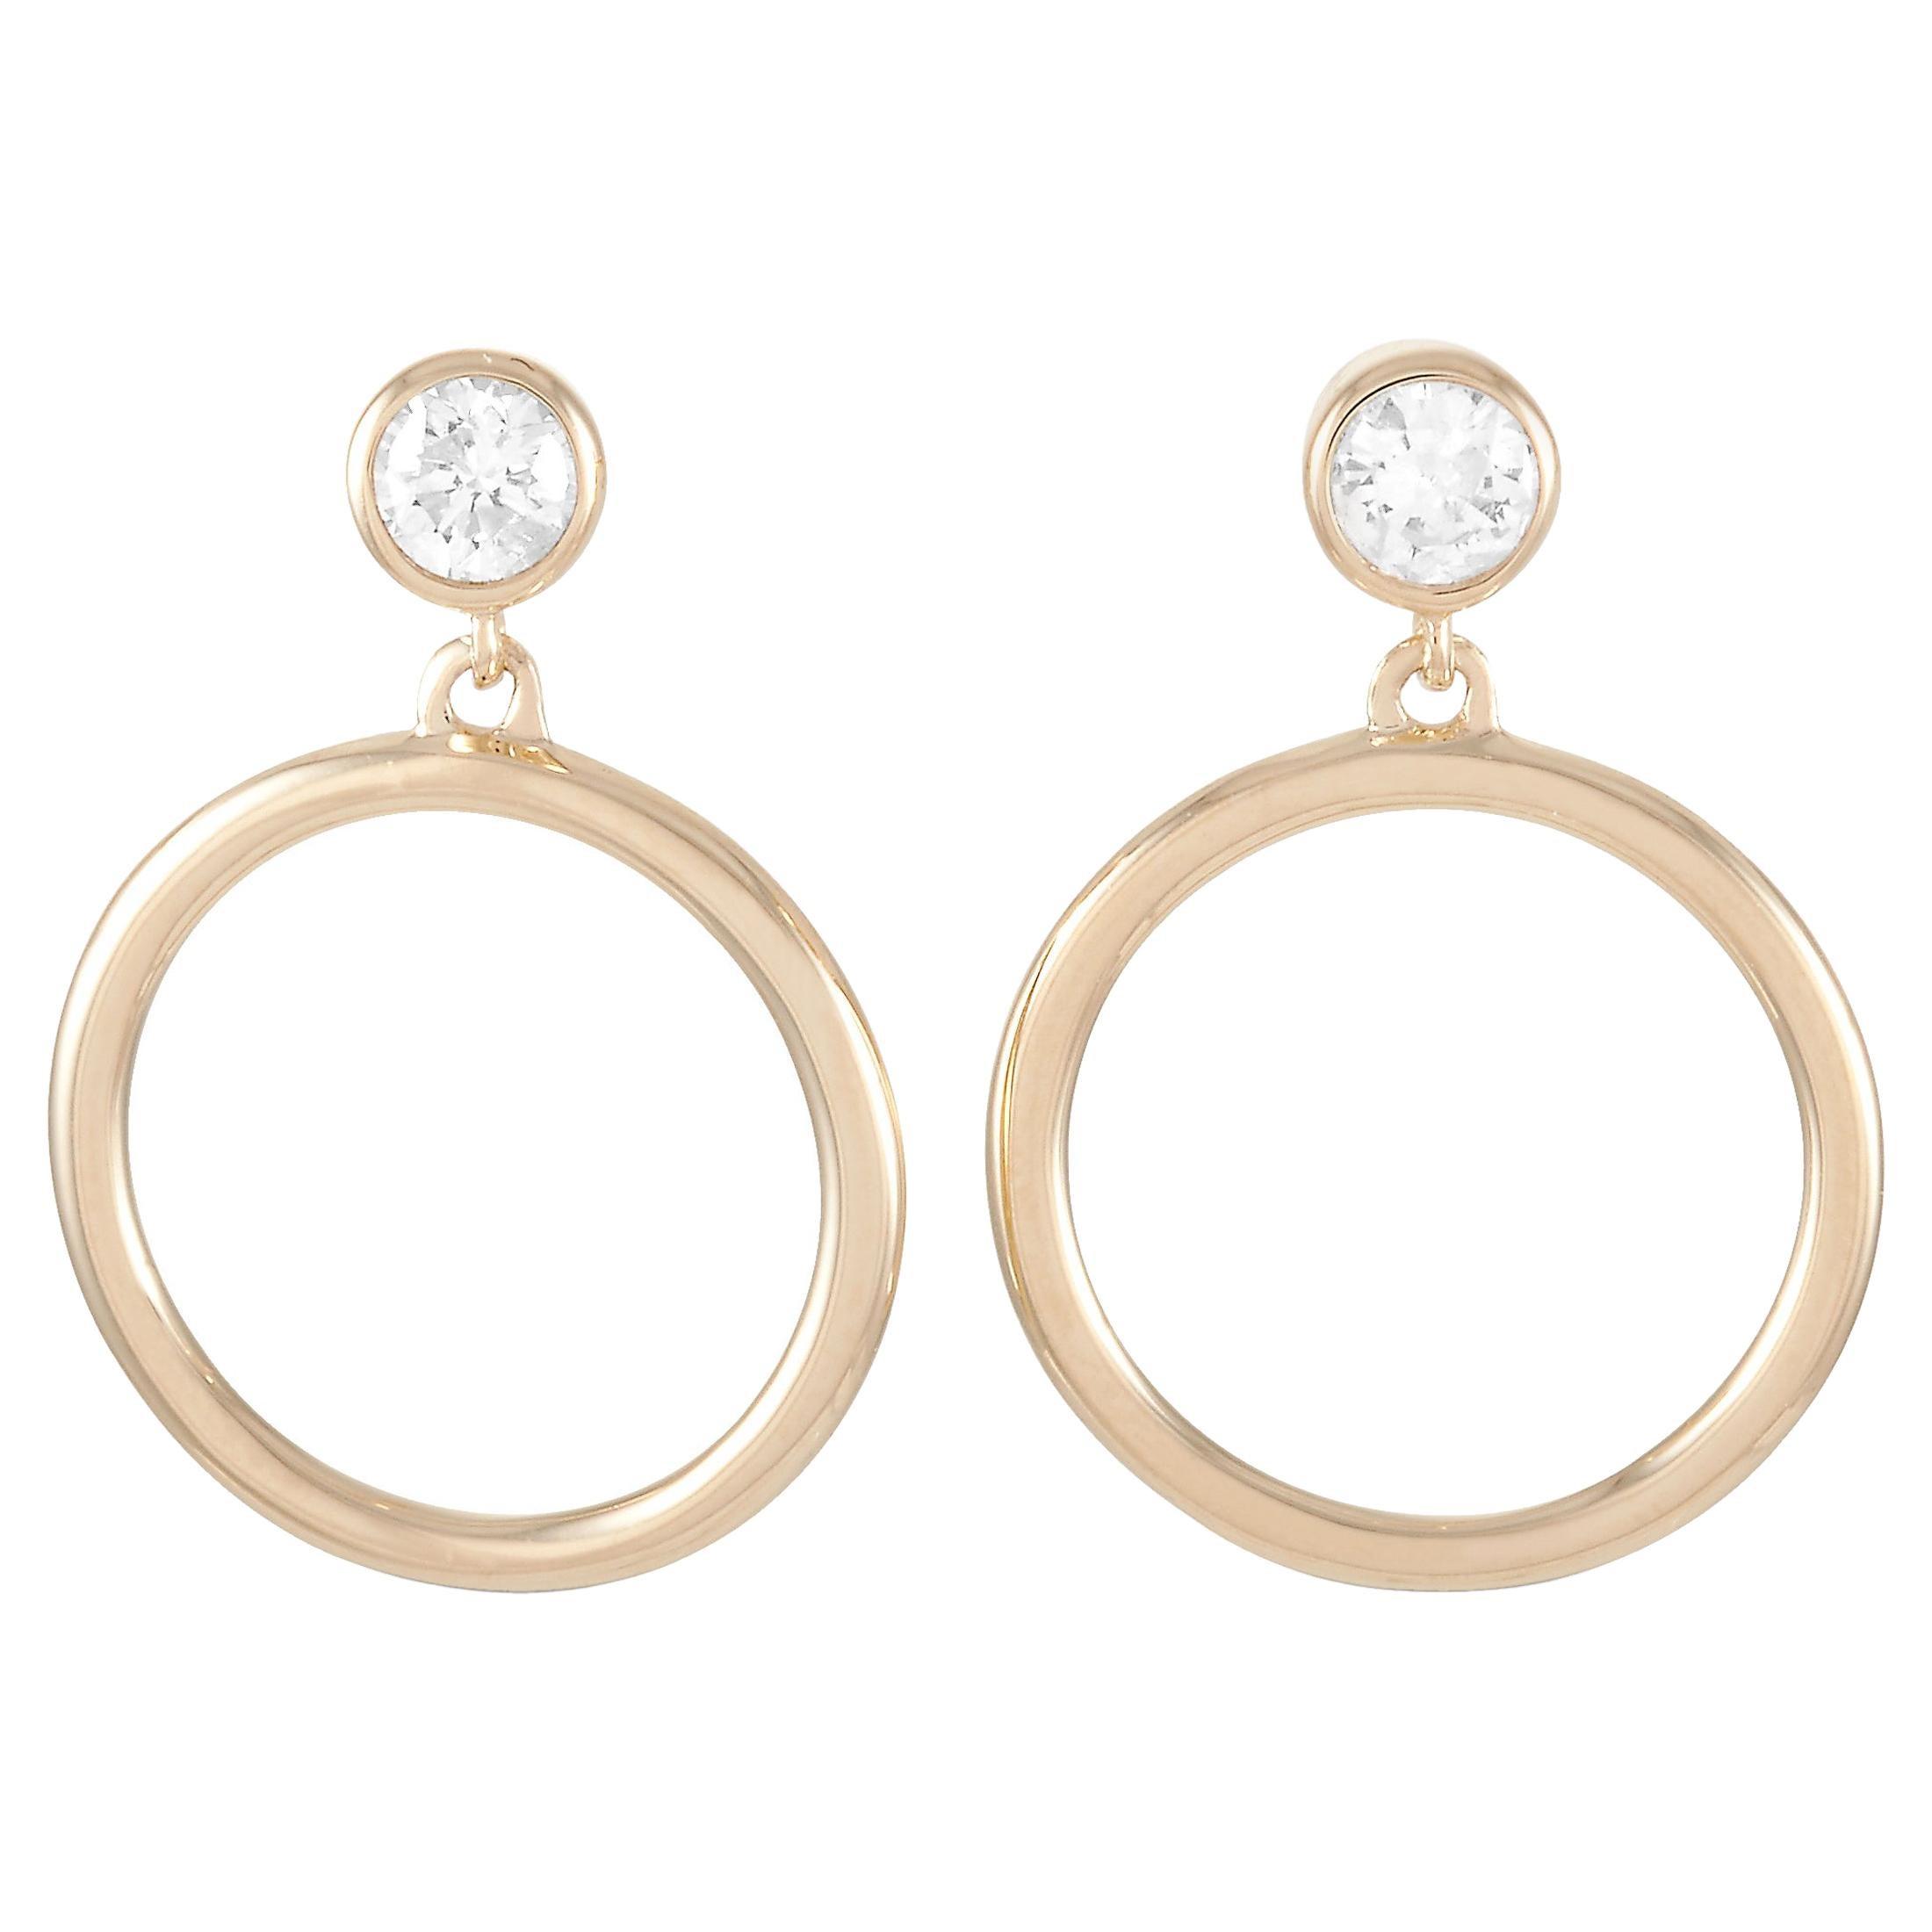 LB Exclusive 14 Karat Yellow Gold 0.18 Carat Diamond Earrings